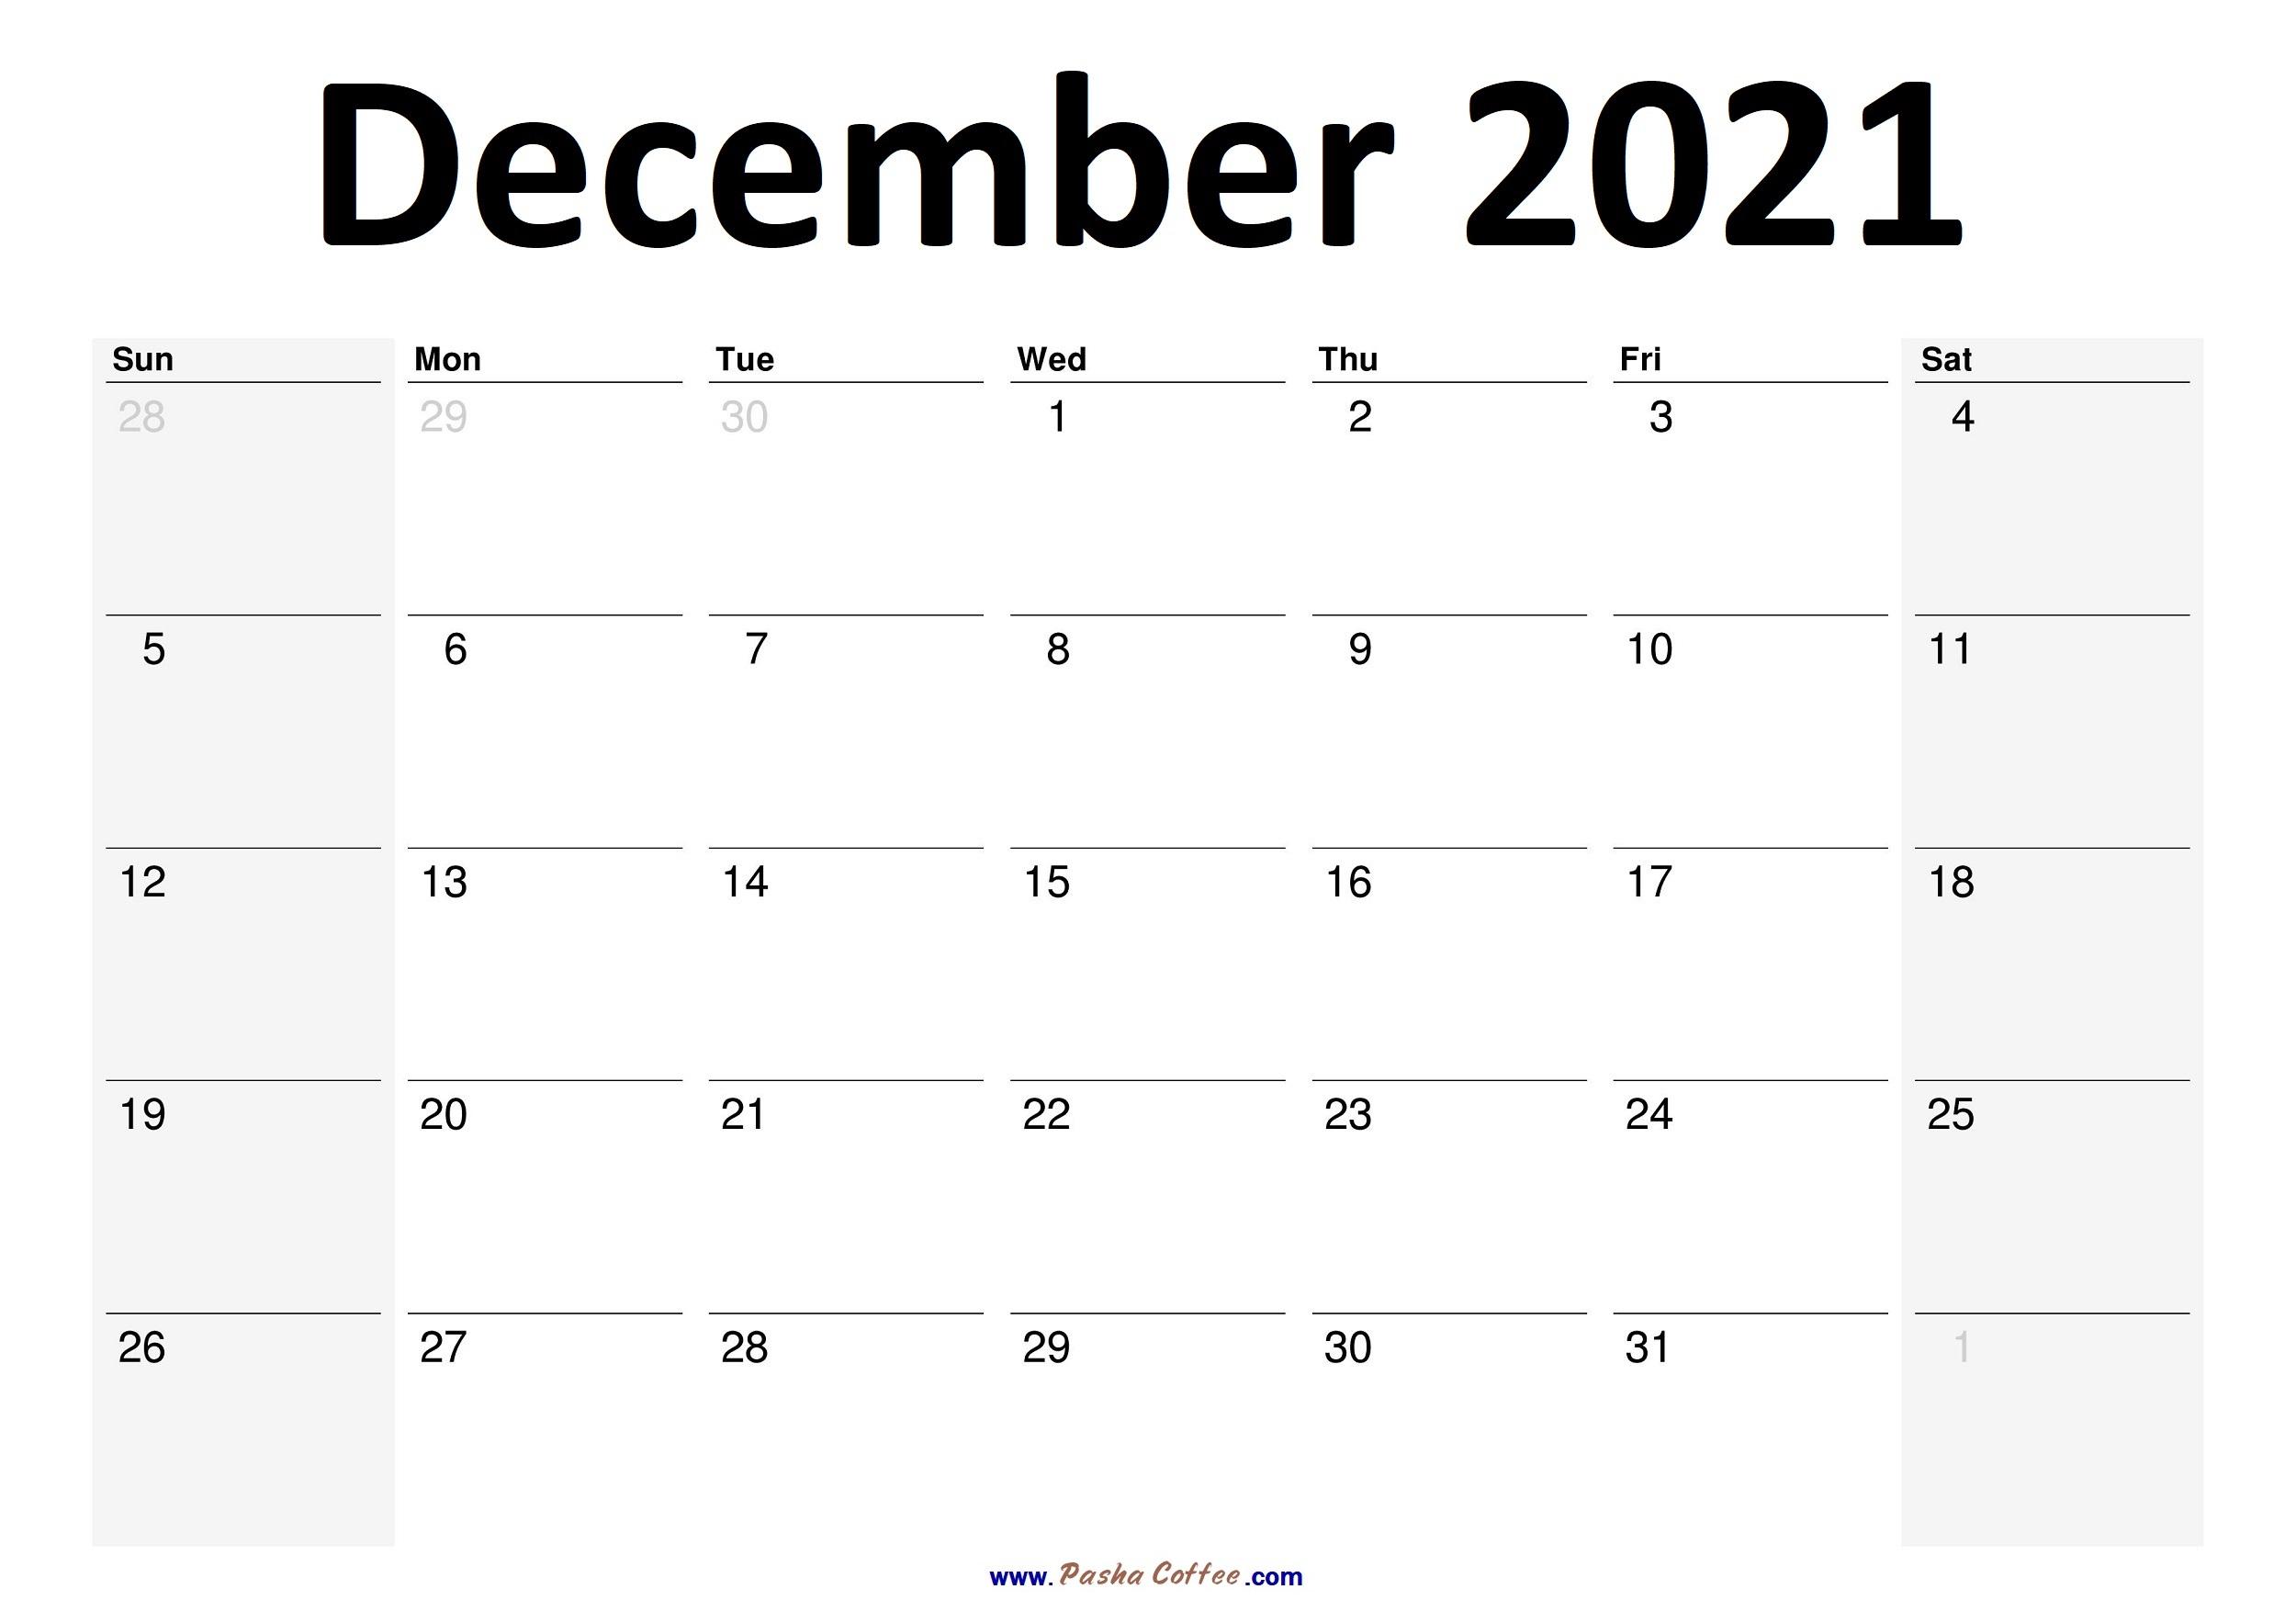 2021 December Calendar Planner Printable Monthly |